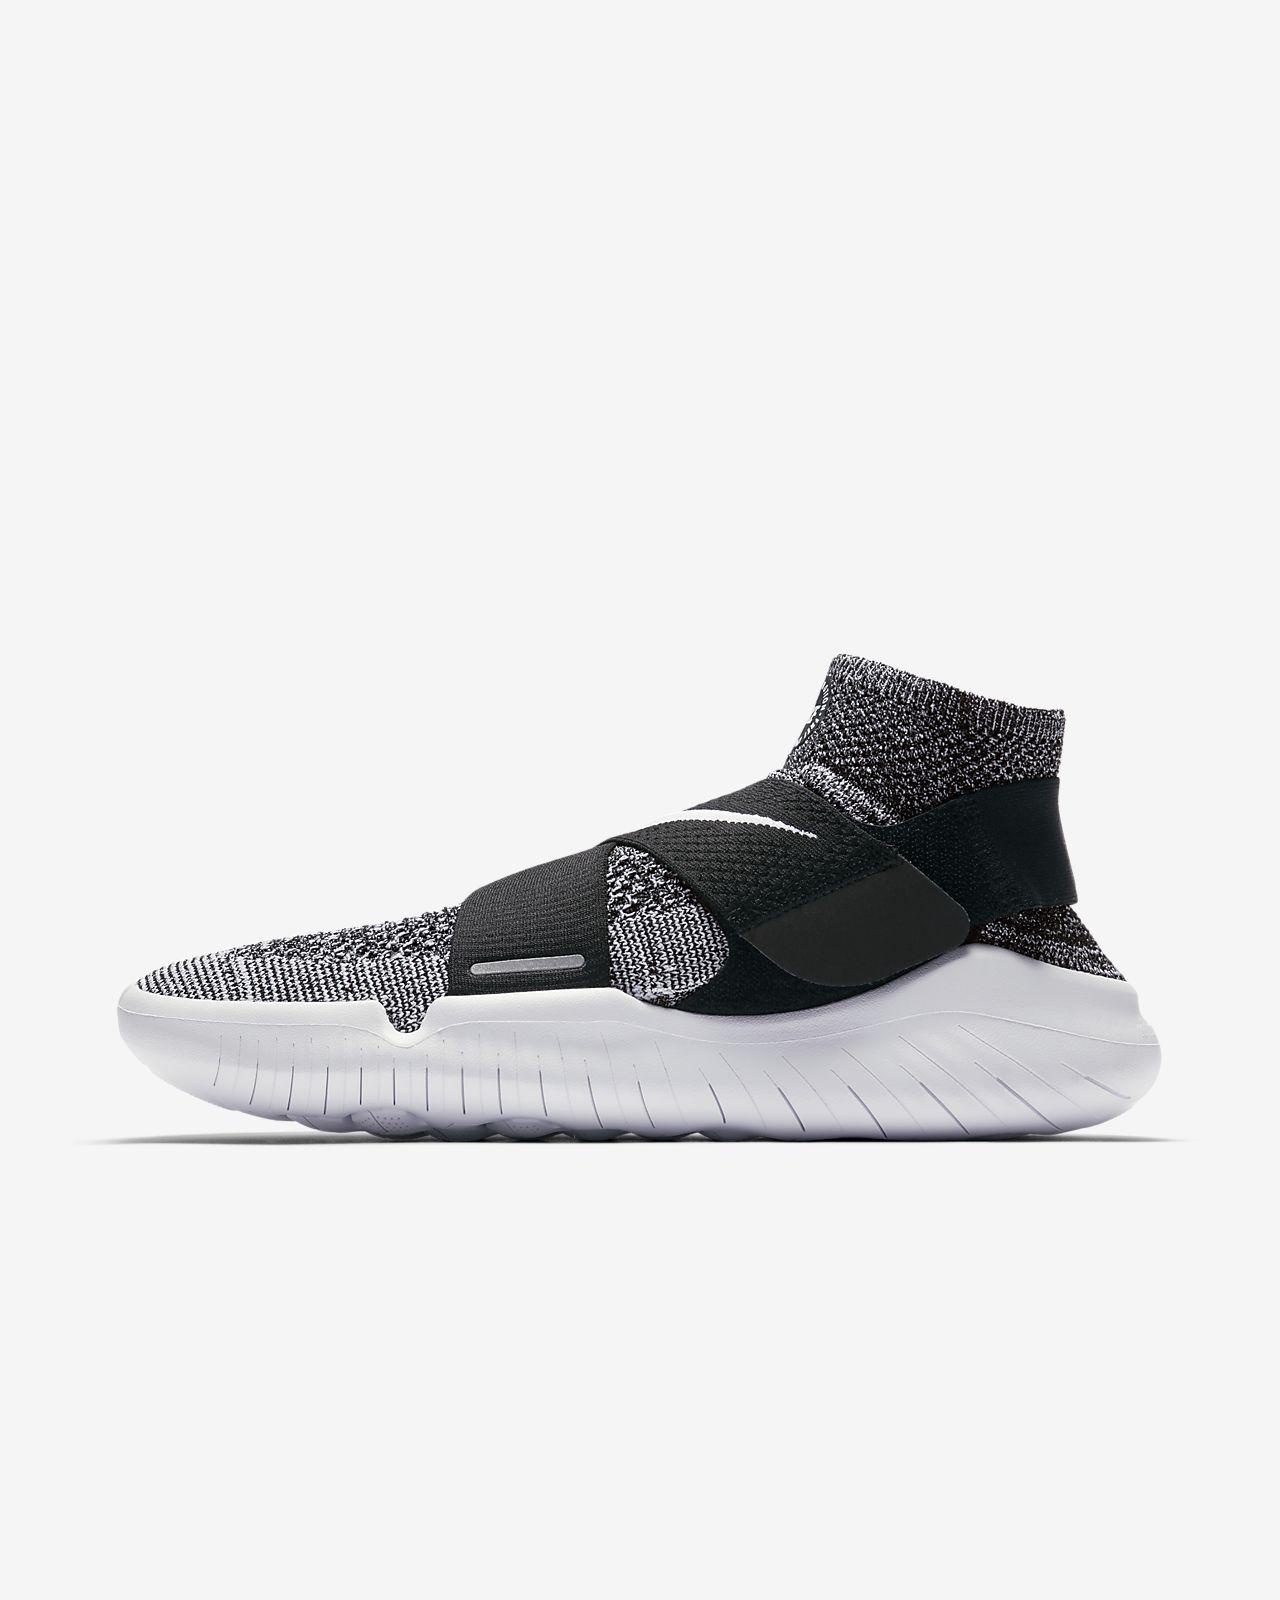 innovative design 017f6 12ad7 Nike - Free RN Motion Flyknit 2017 Hommes chaussure de course (noir) - EU